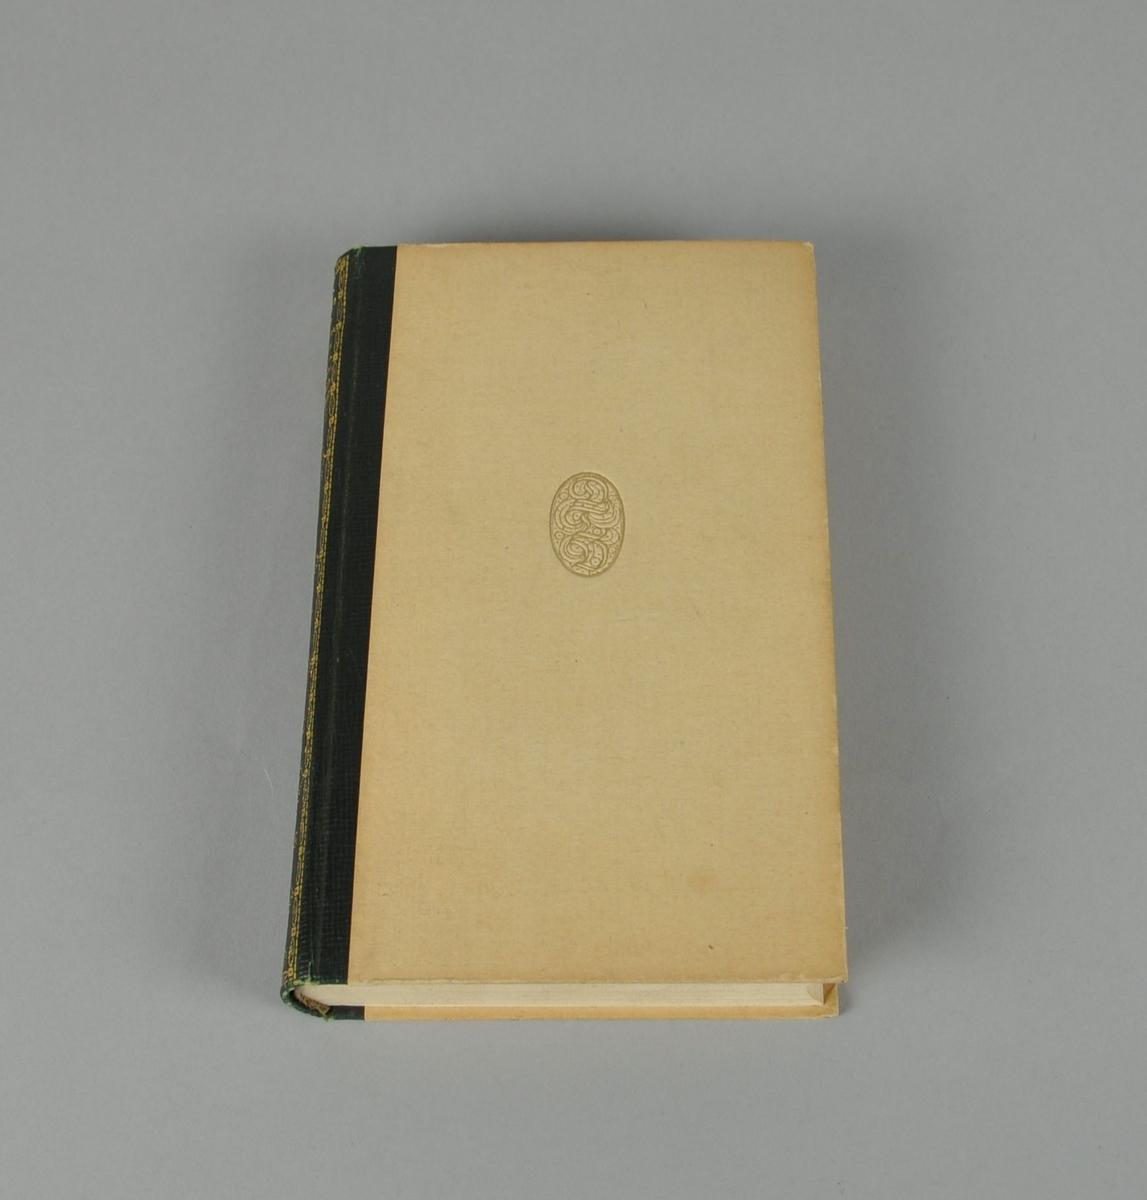 s. 490.